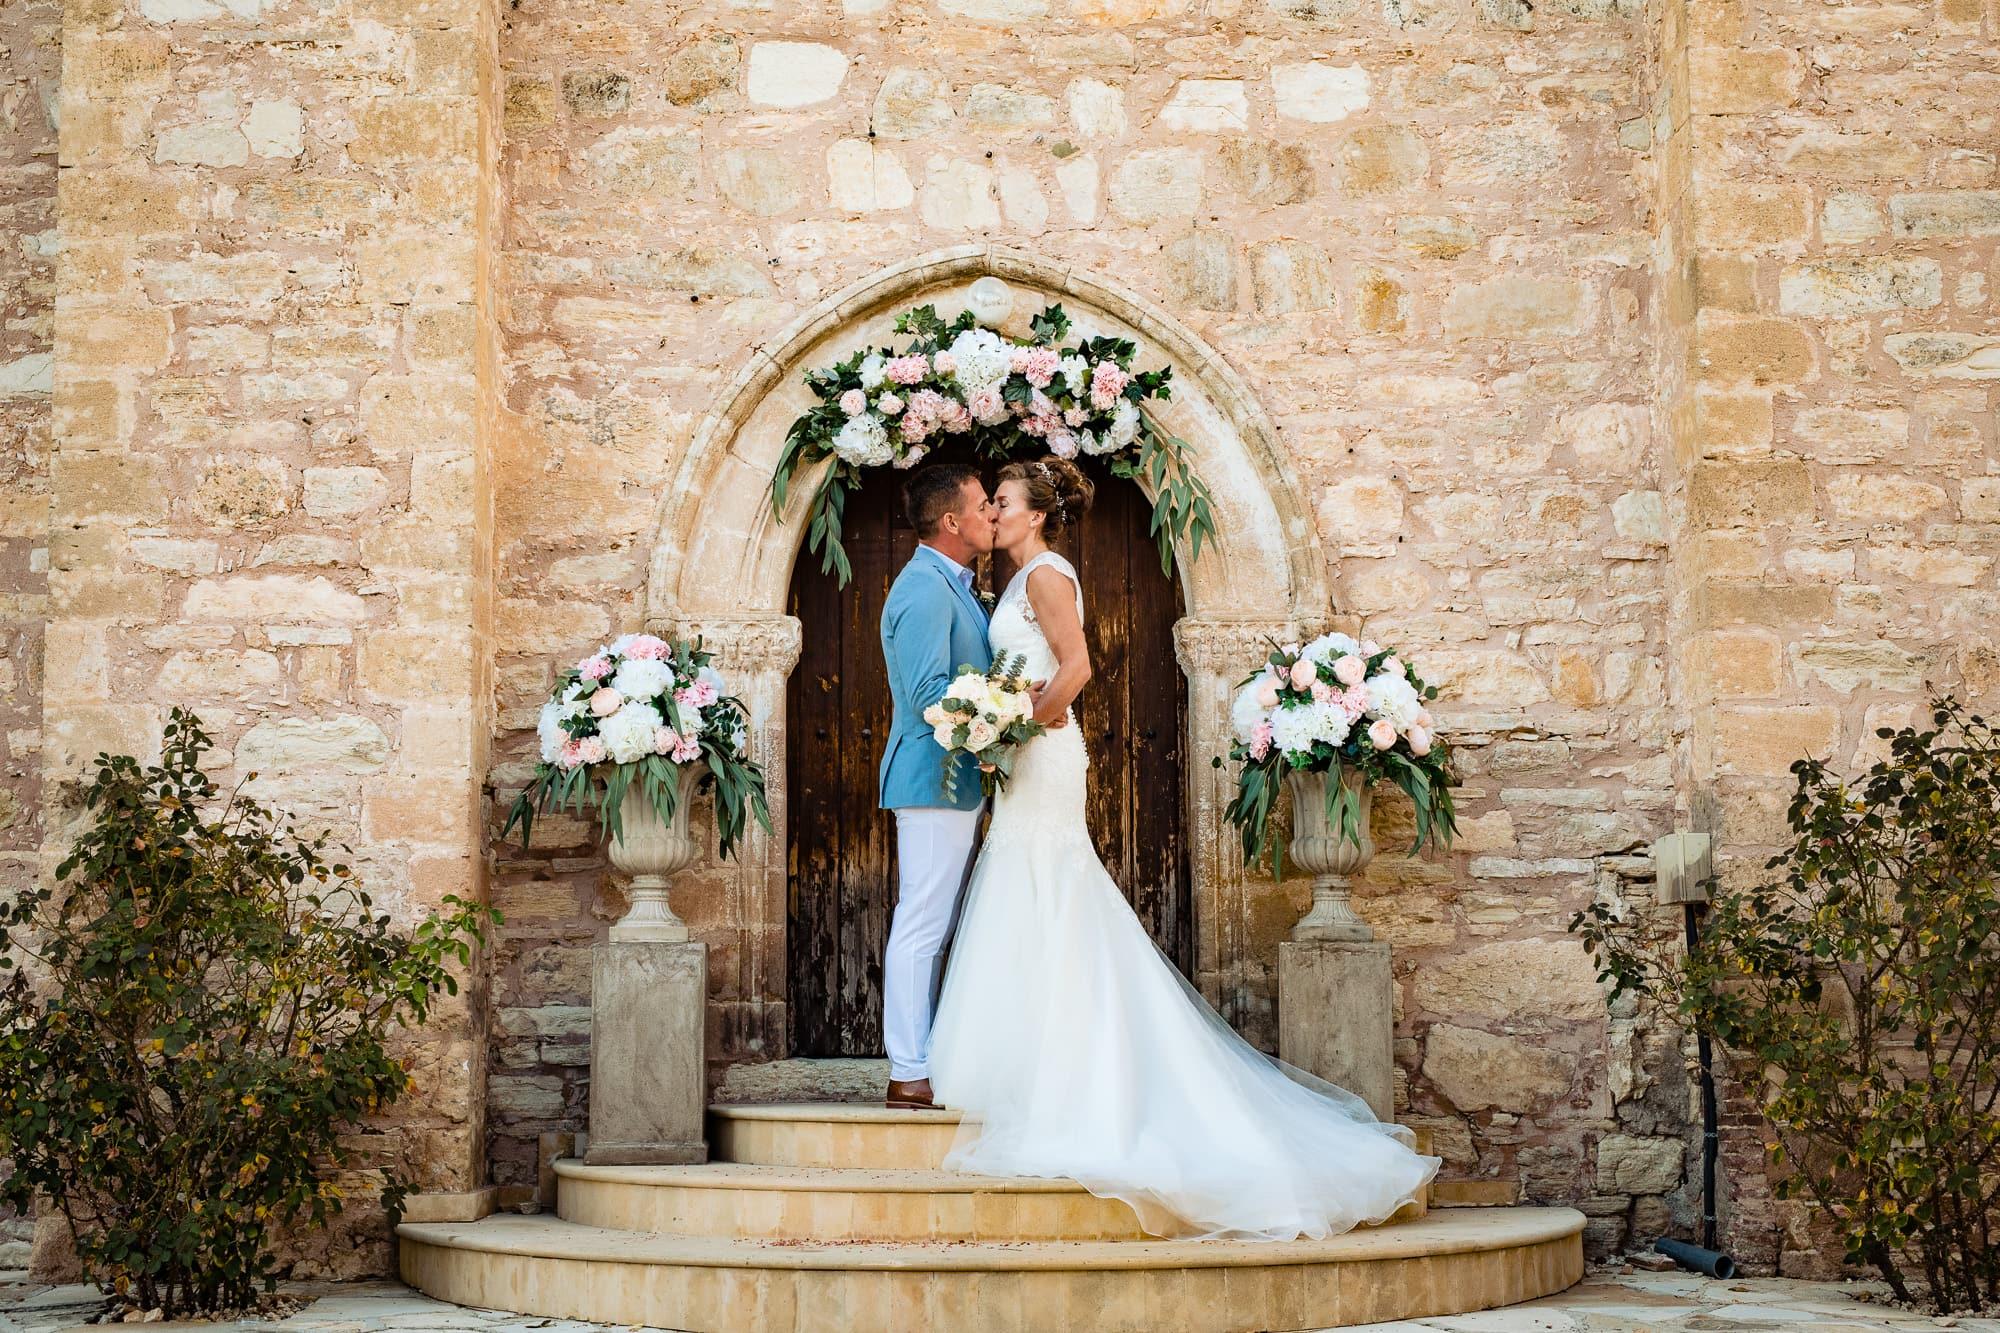 Bride and Groom Paphos Cyprus Wedding